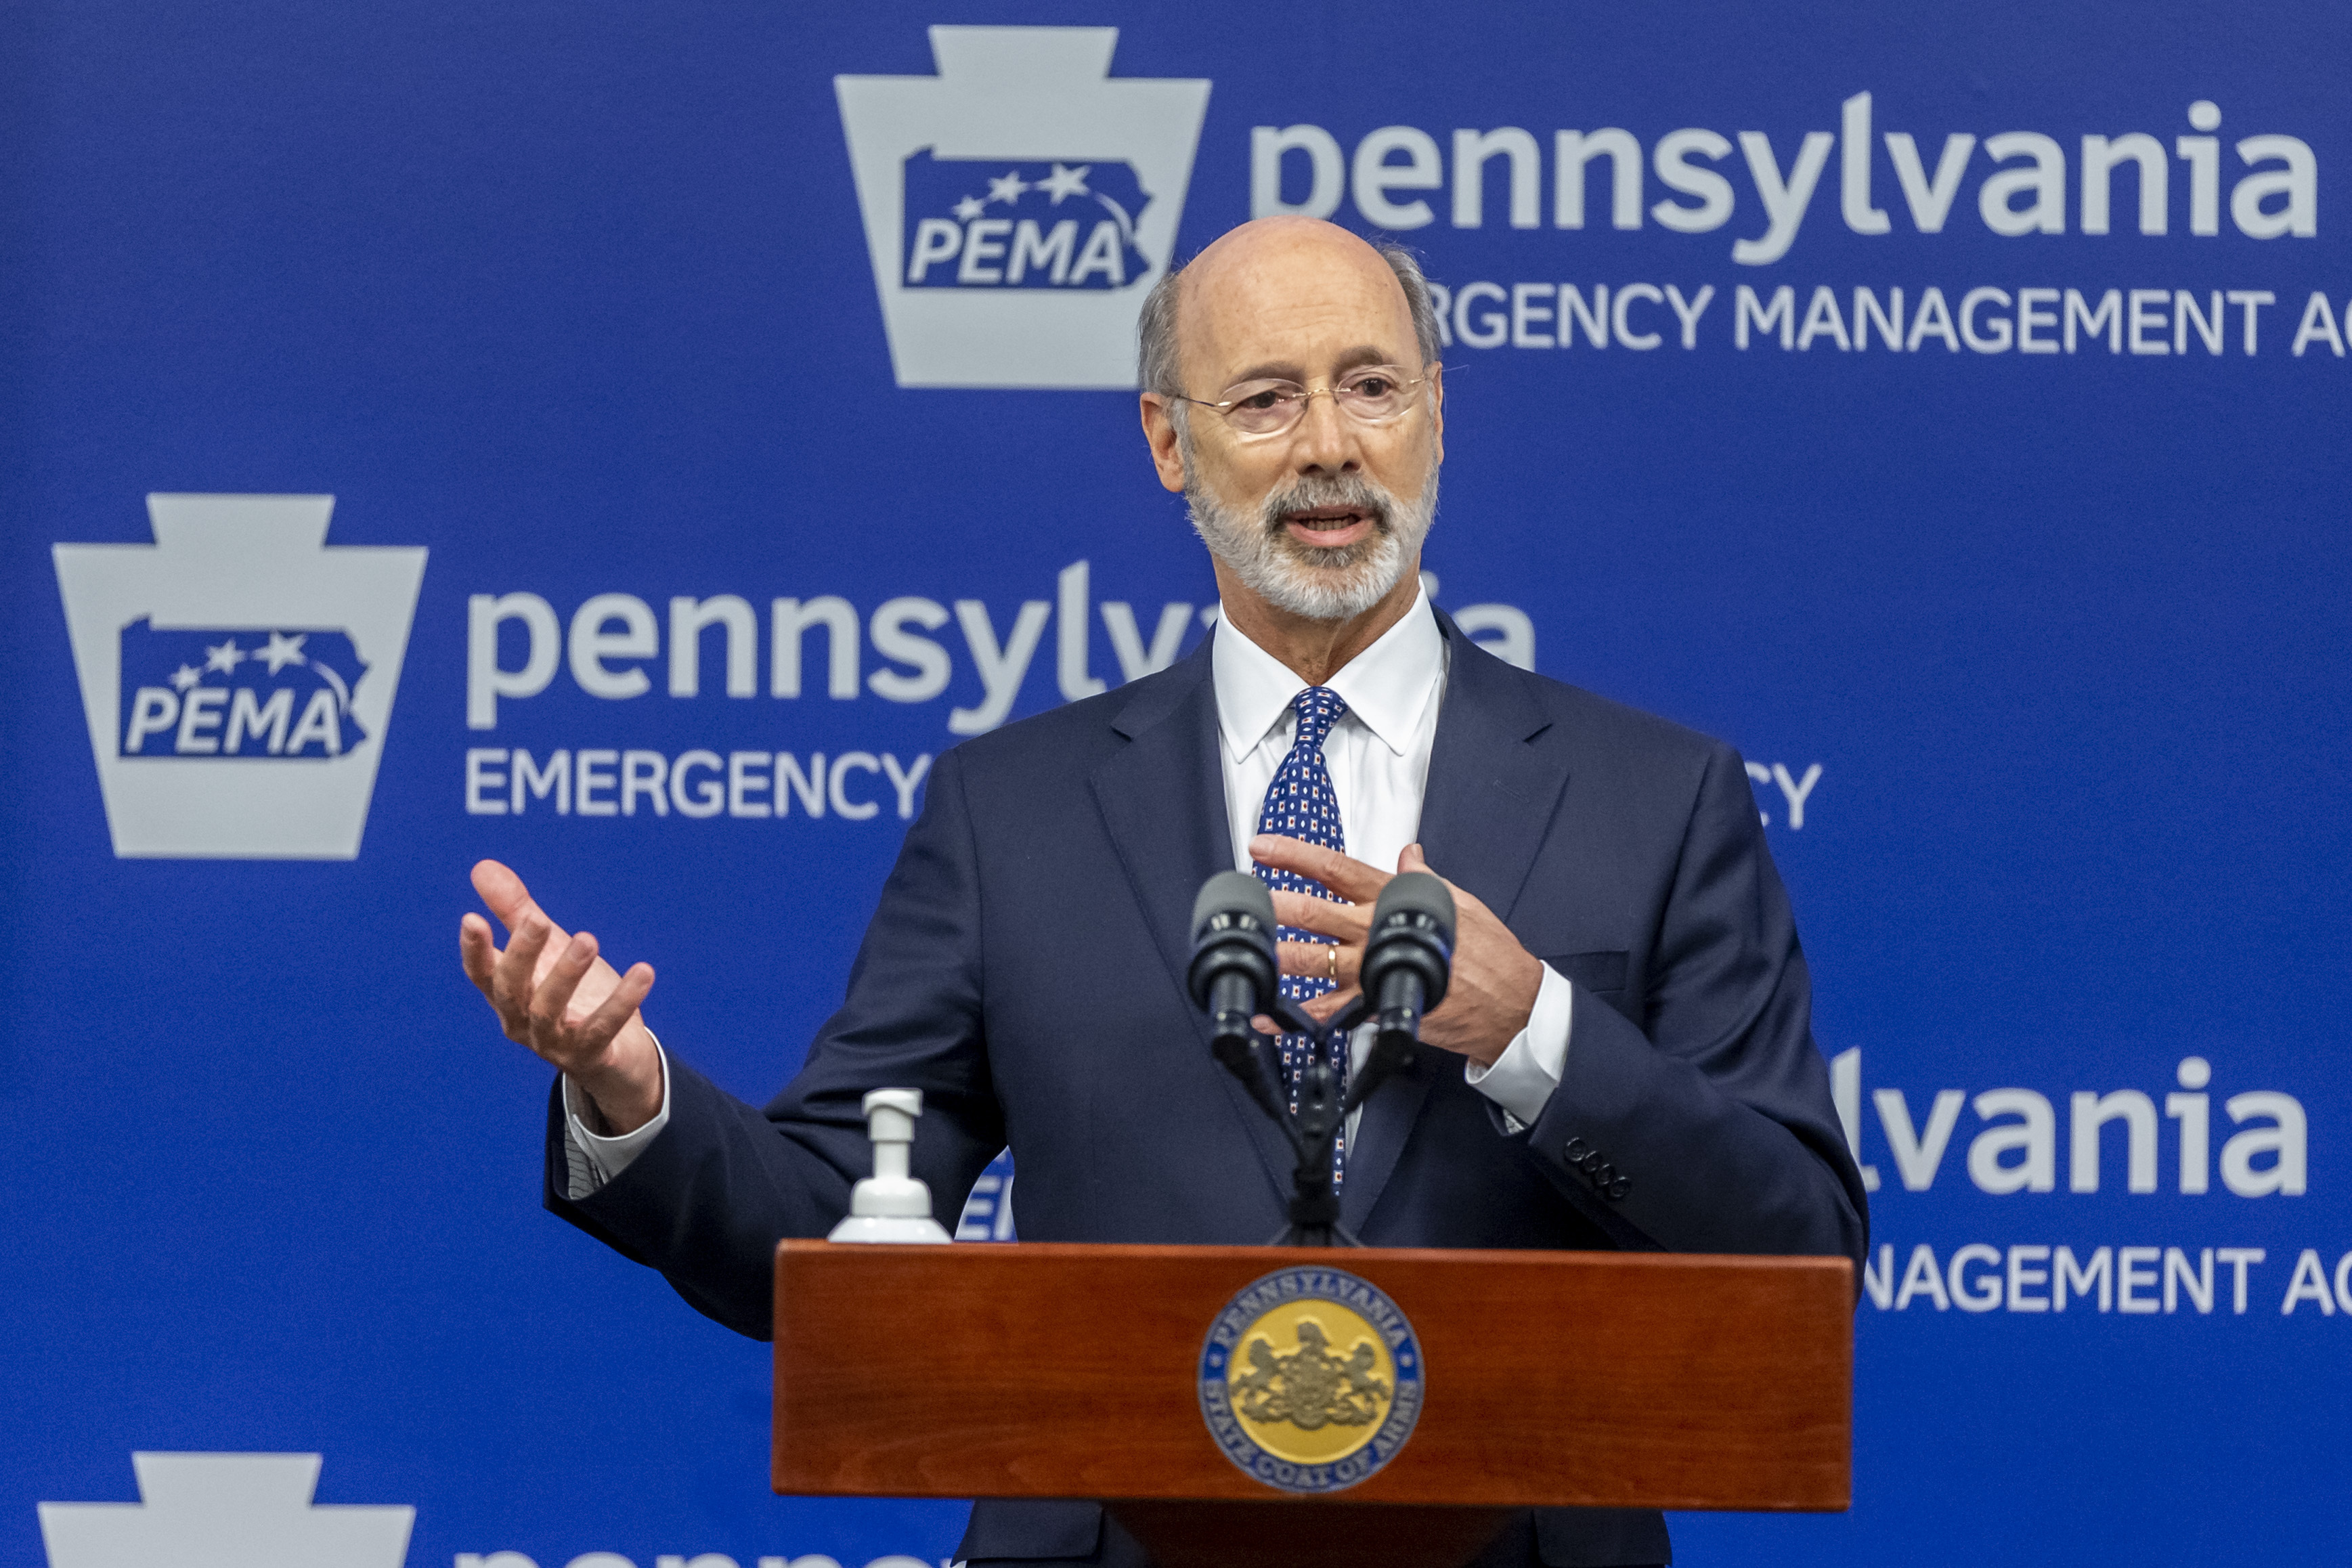 Pennsylvania Gov. Tom Wolf speaks with the media in Harrisburg, Pennsylvania, on May 29.